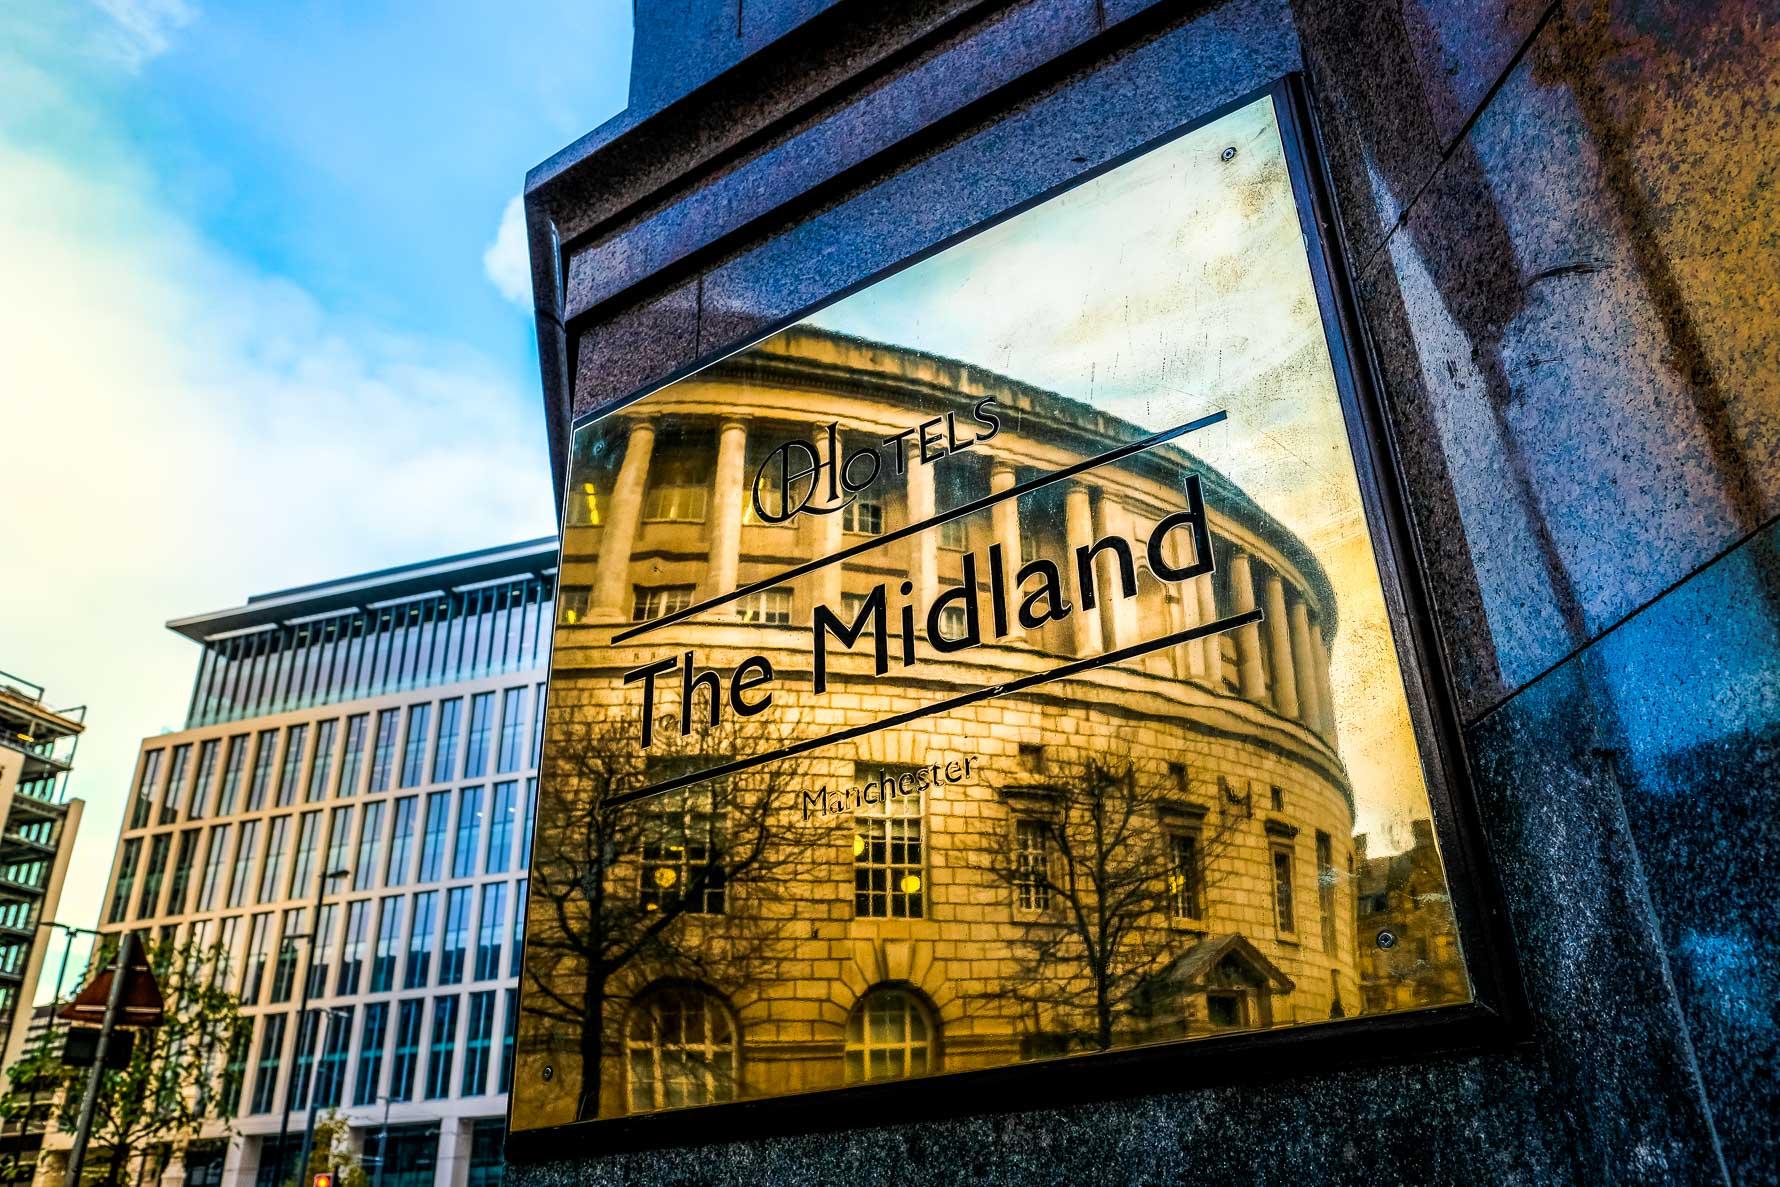 midland hotel sign